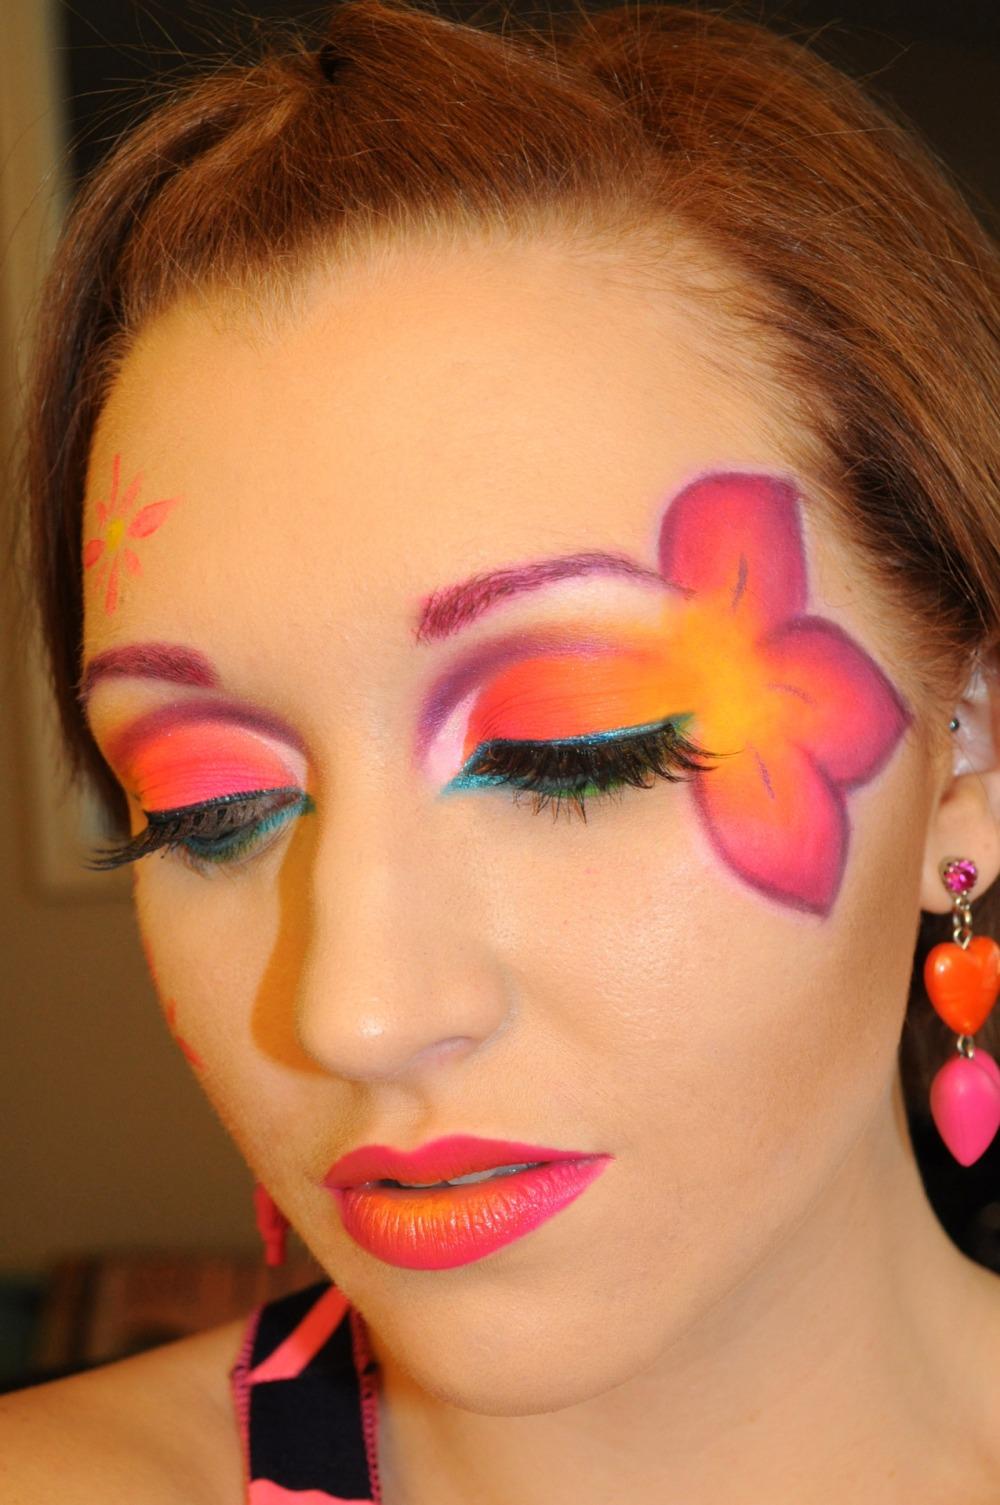 Makeup Gurus On Youtube: My Favorite YouTube Beauty Gurus